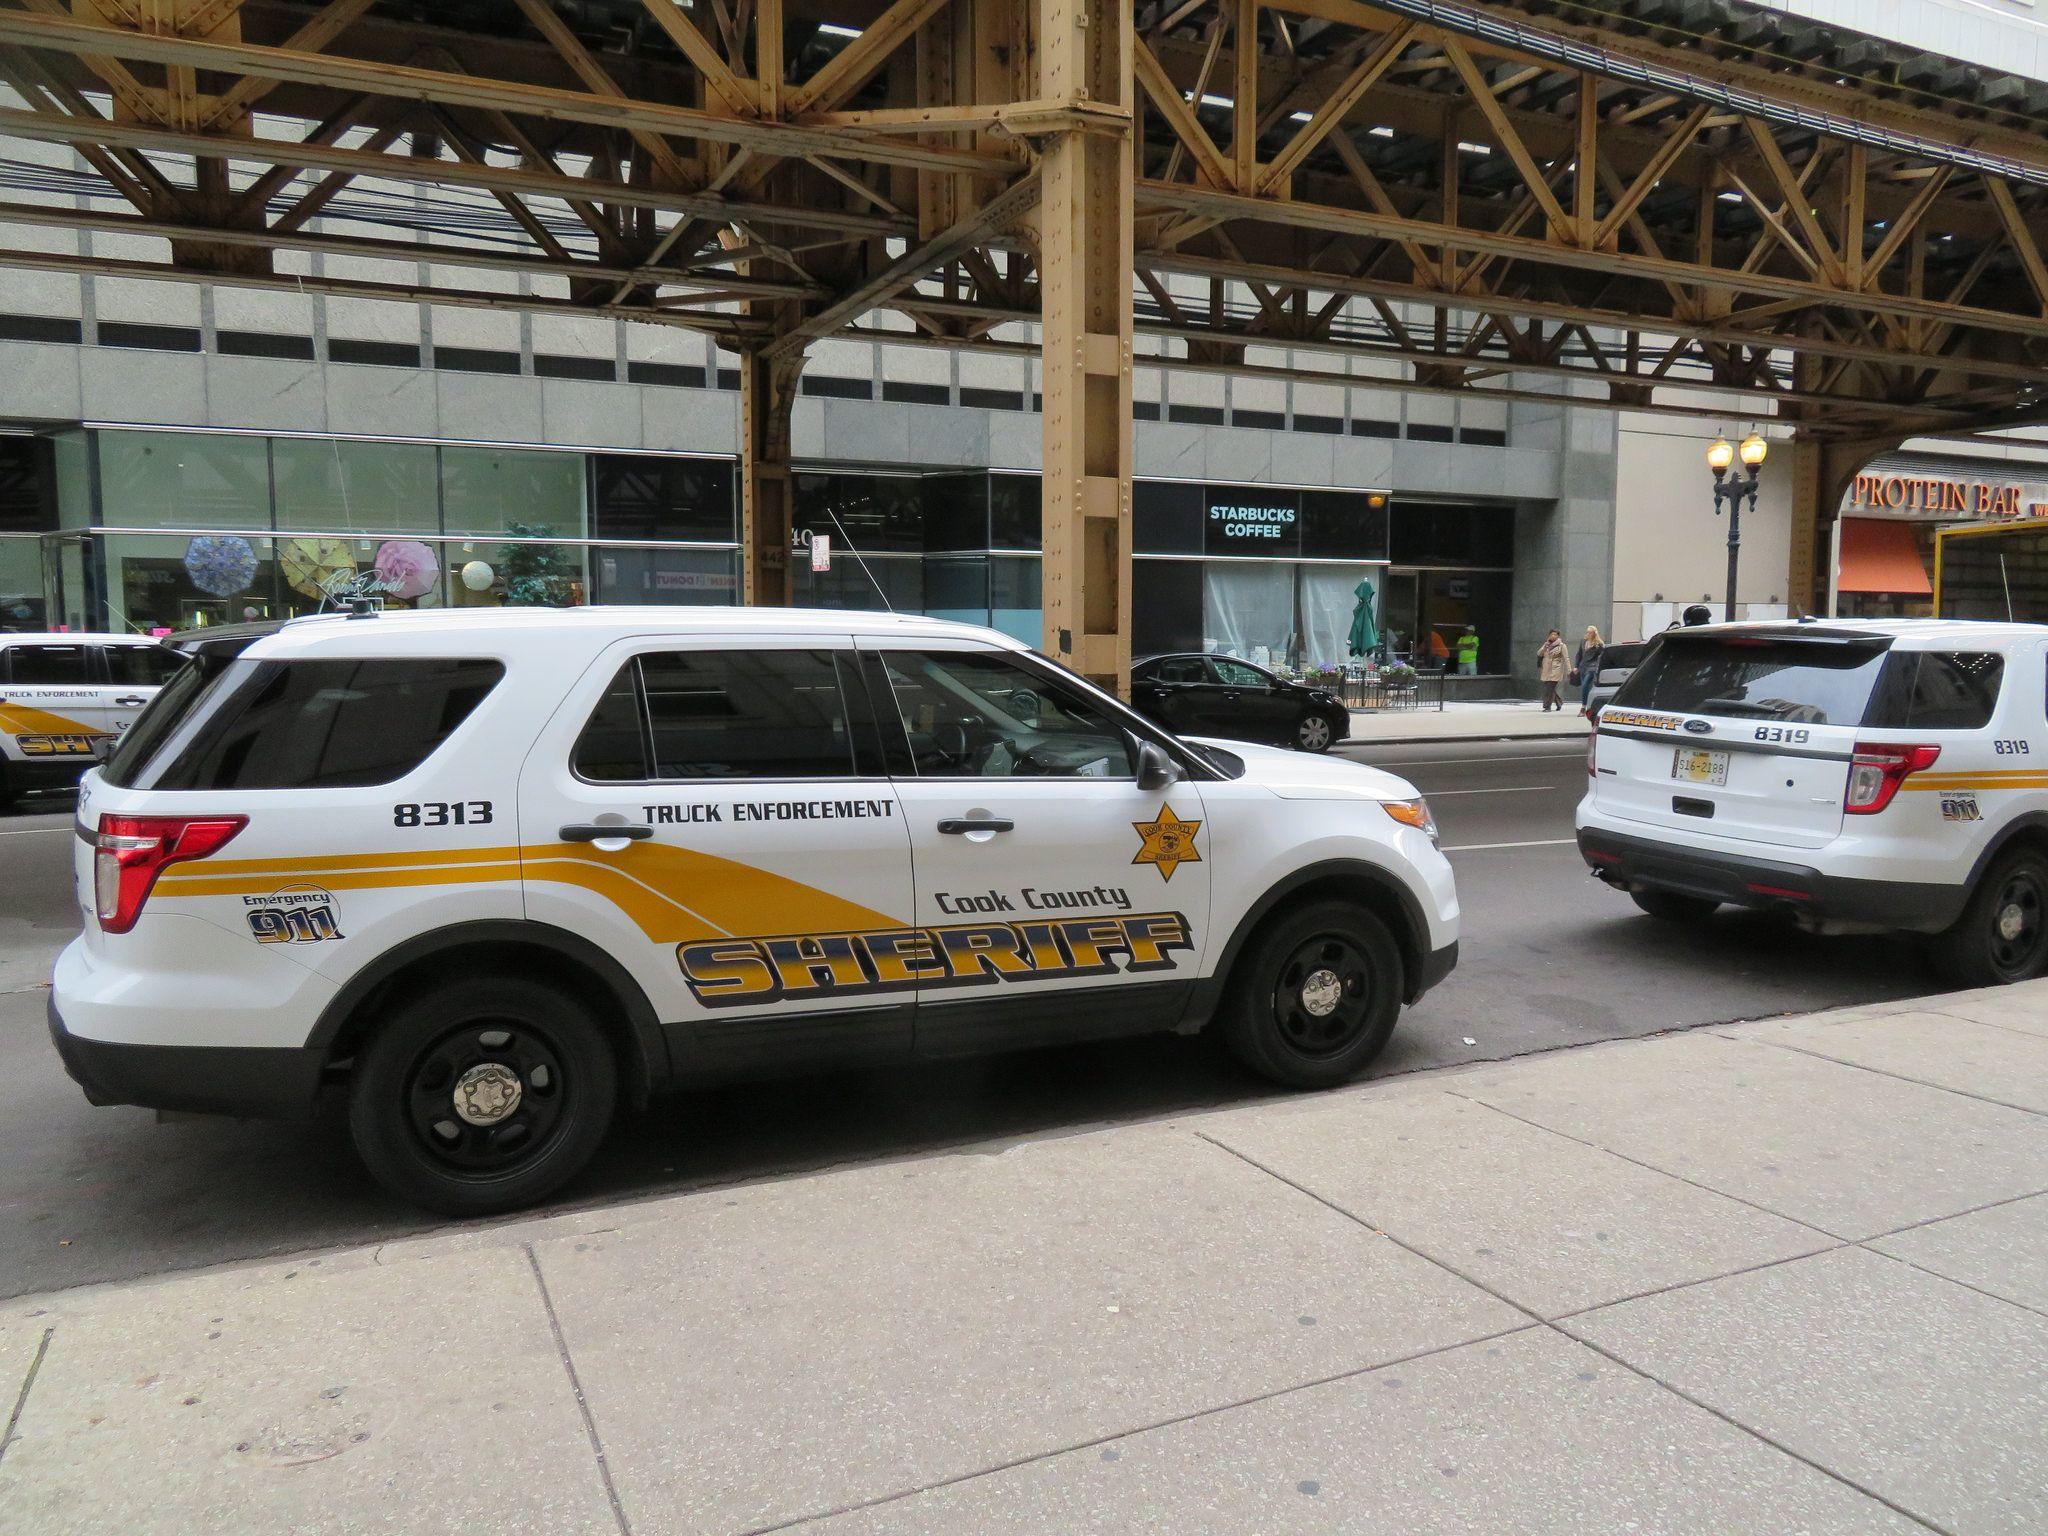 Cook County Sheriff Truck Enforcement Pinterest